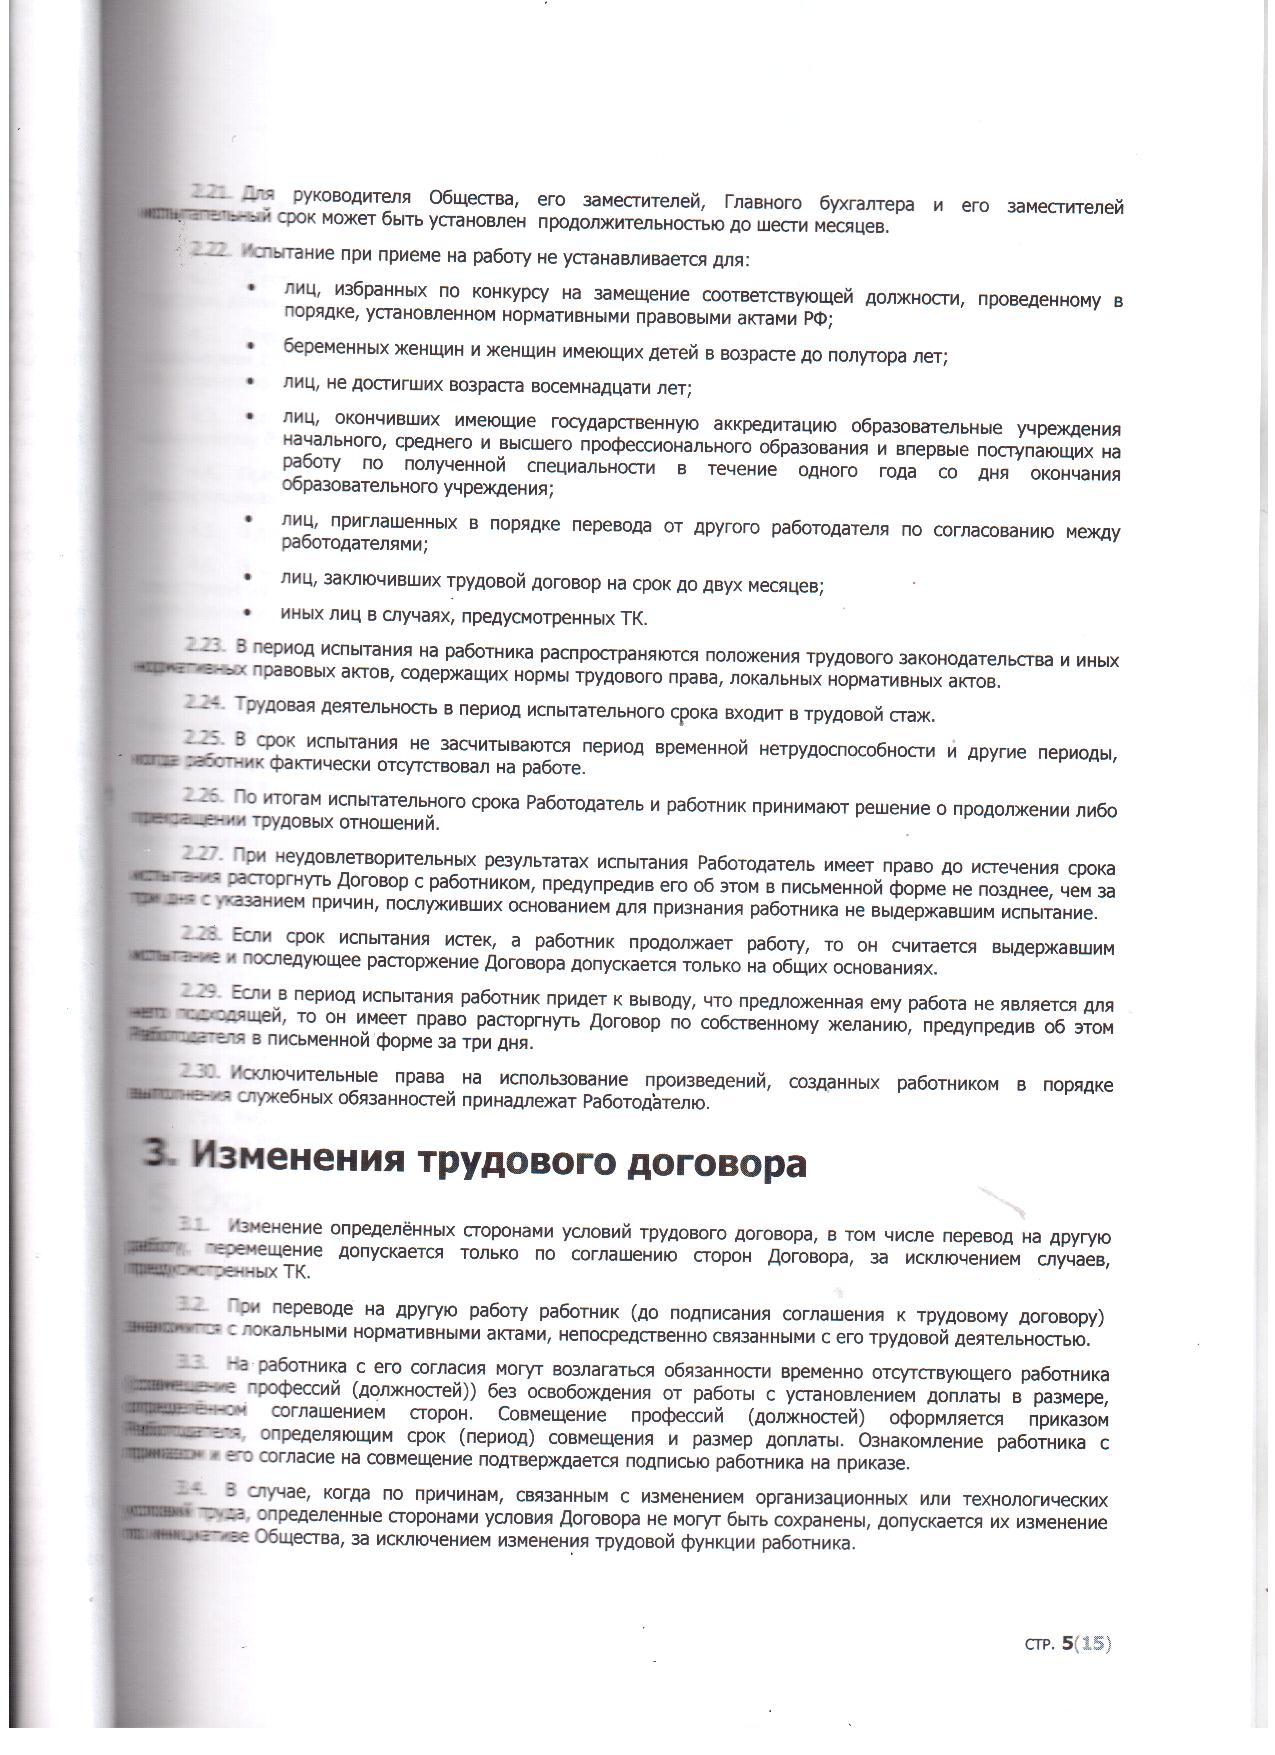 Правила внутреннего трудоговоро распорядка 5